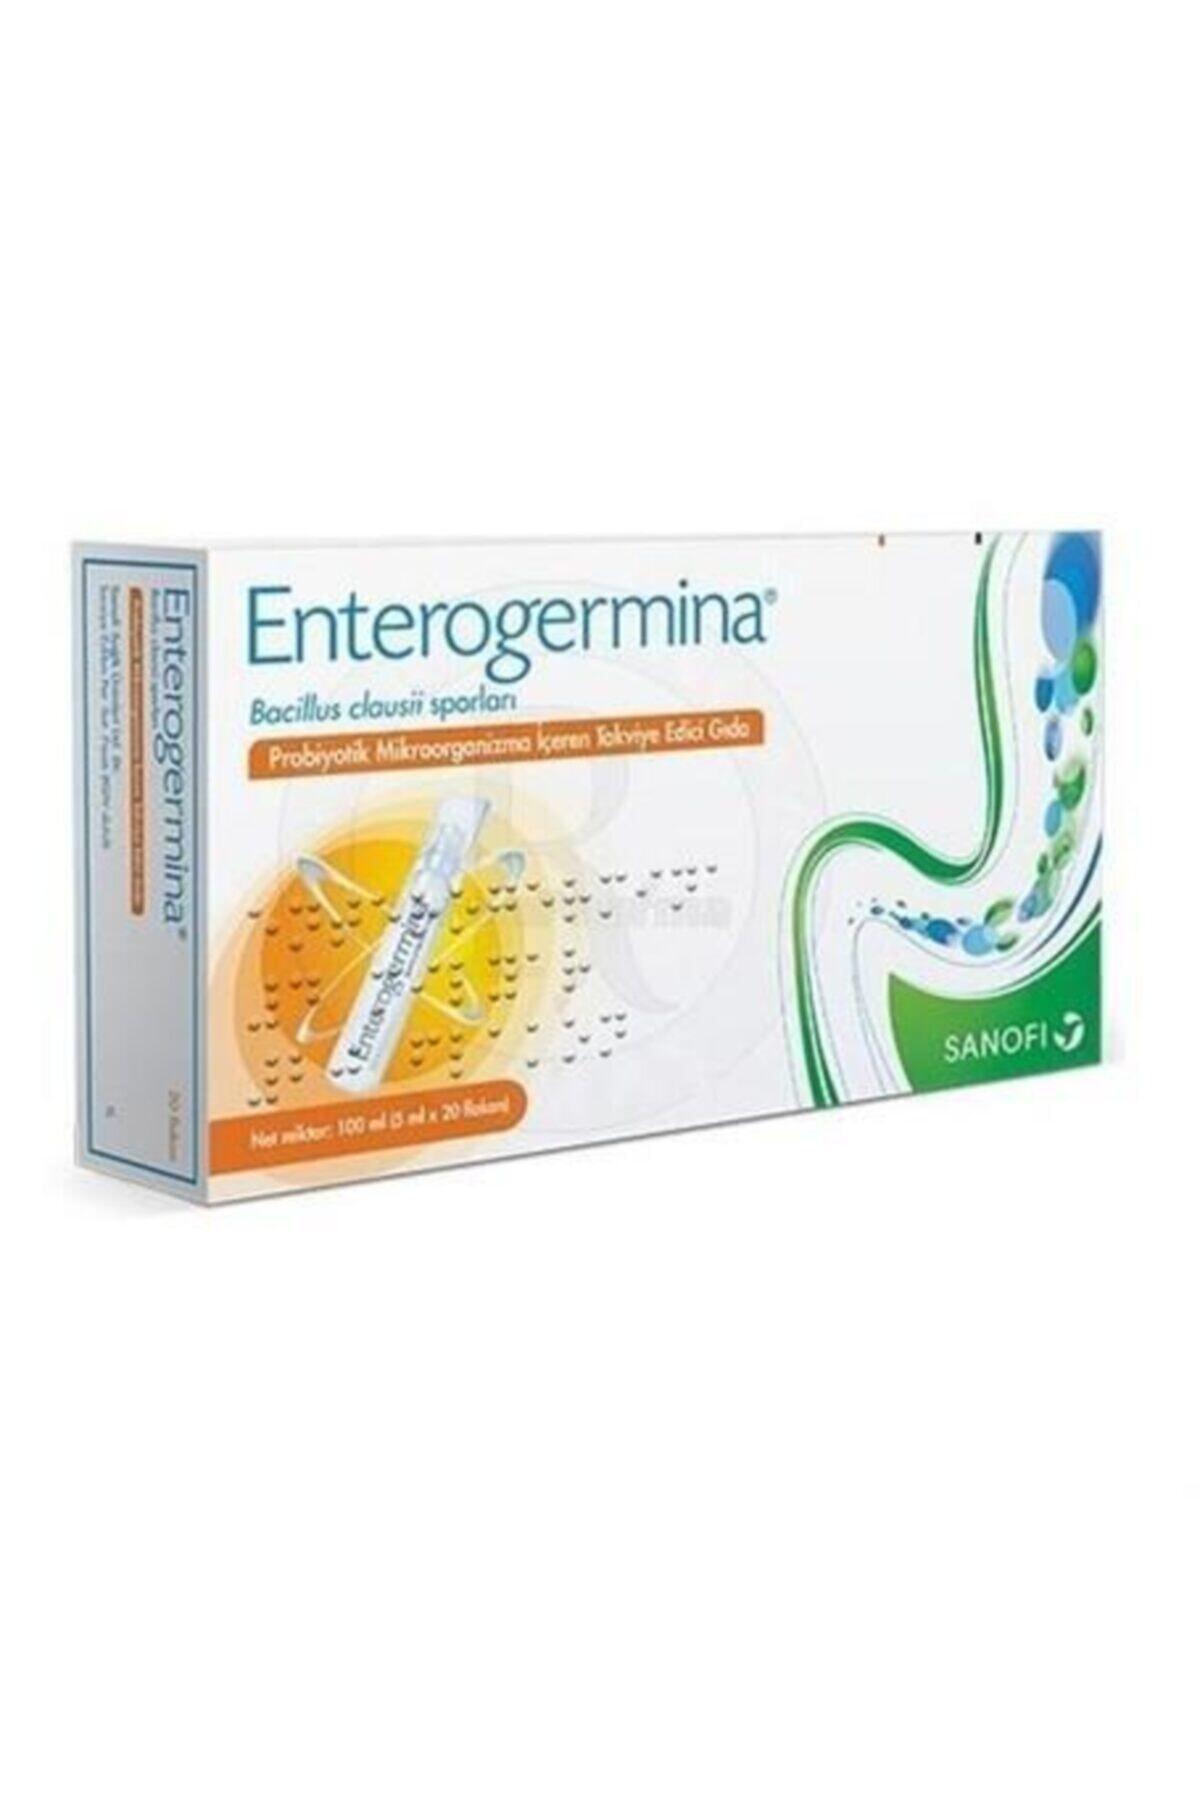 Enterogermina Yetişkin 5 ml X 20 Flakon 1